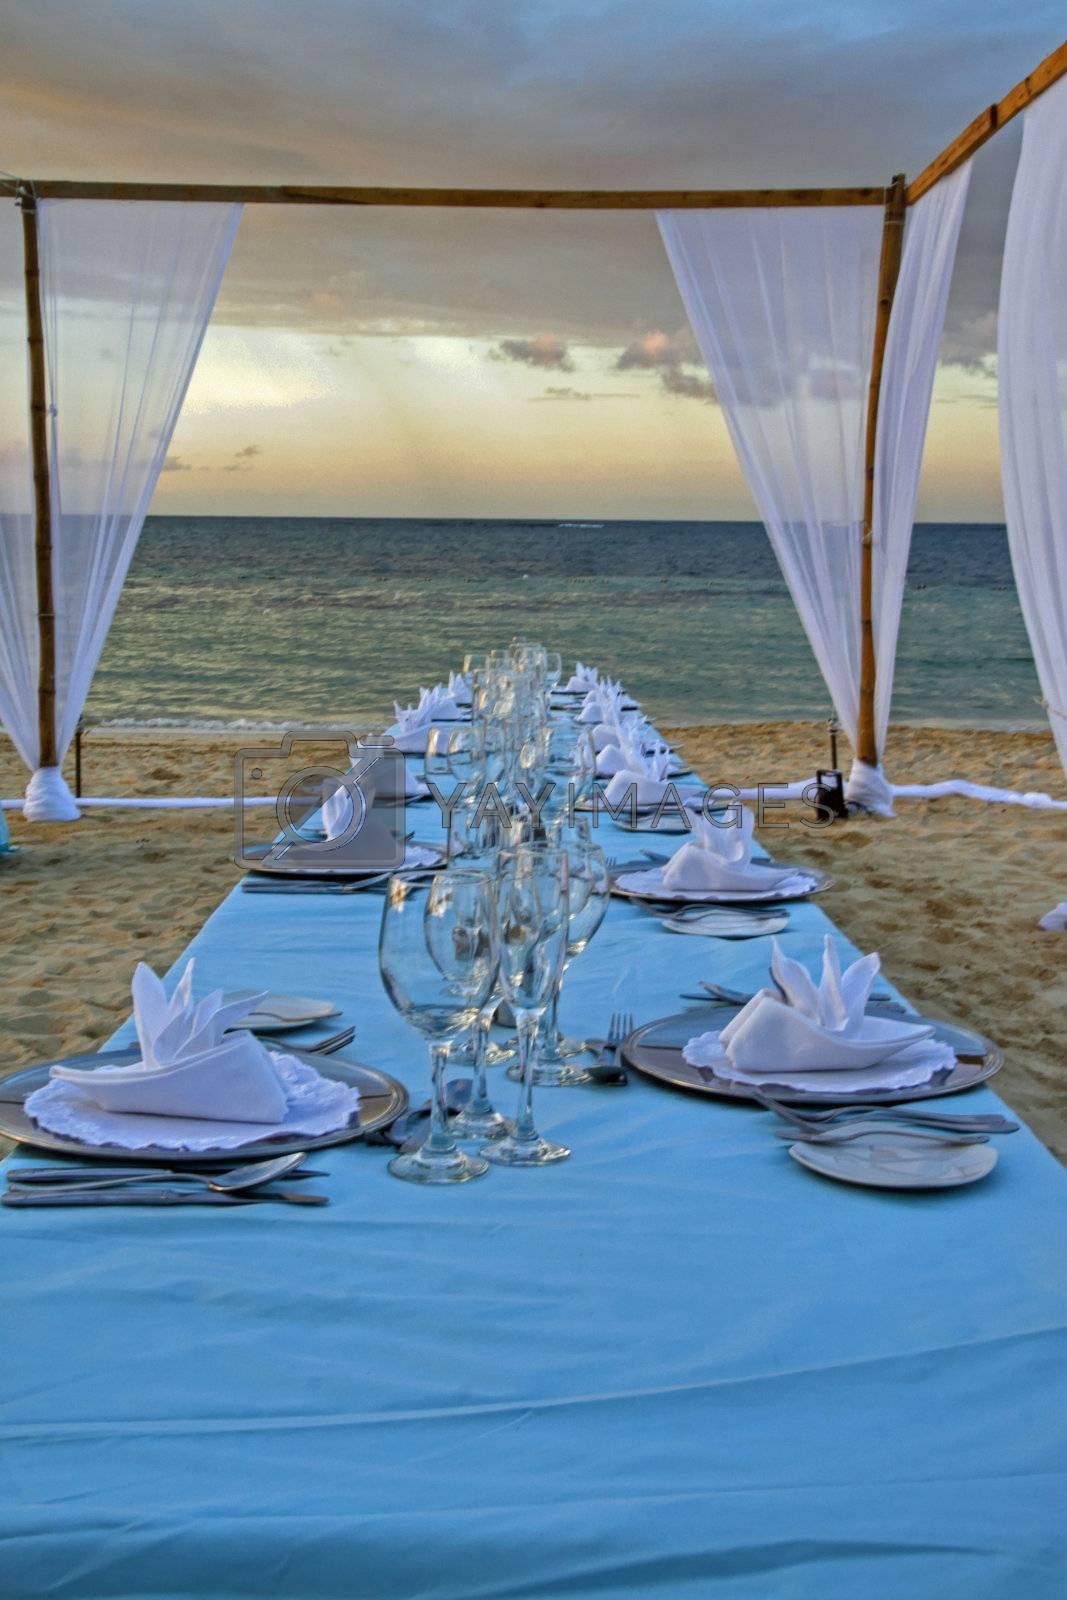 Exterior place setting for ocean side wedding celebration